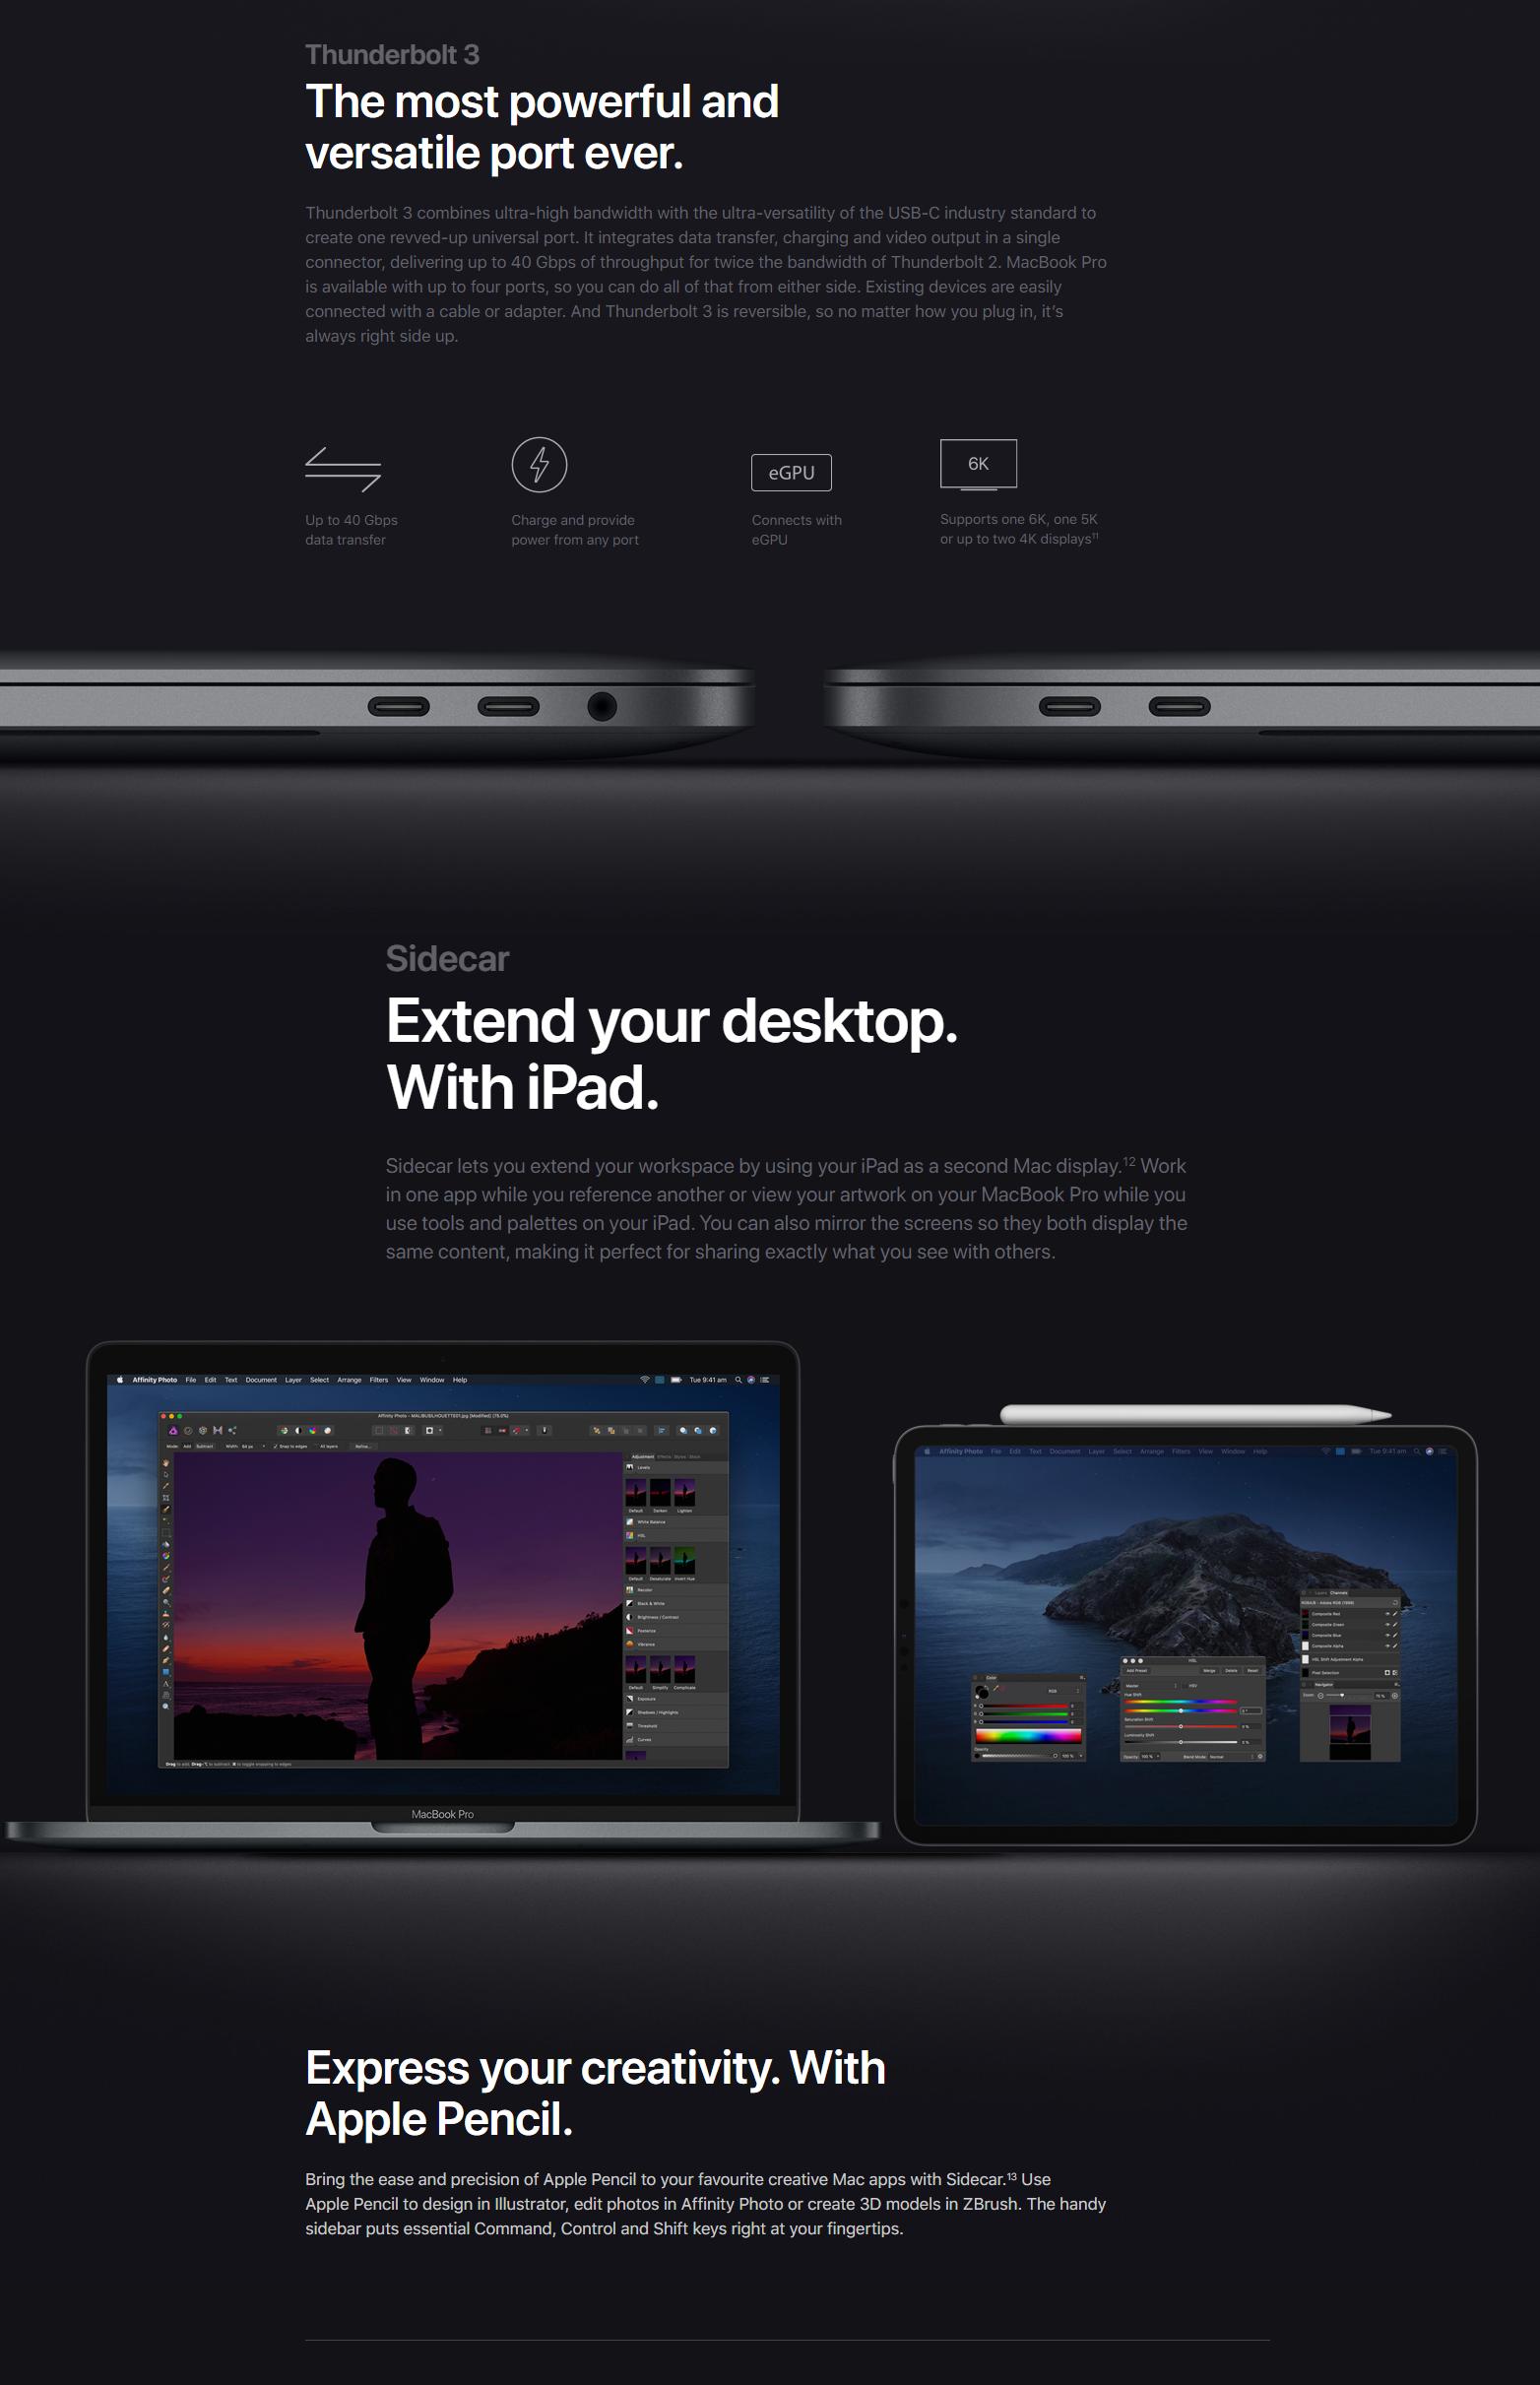 apple macbook pro 13 inch price in india